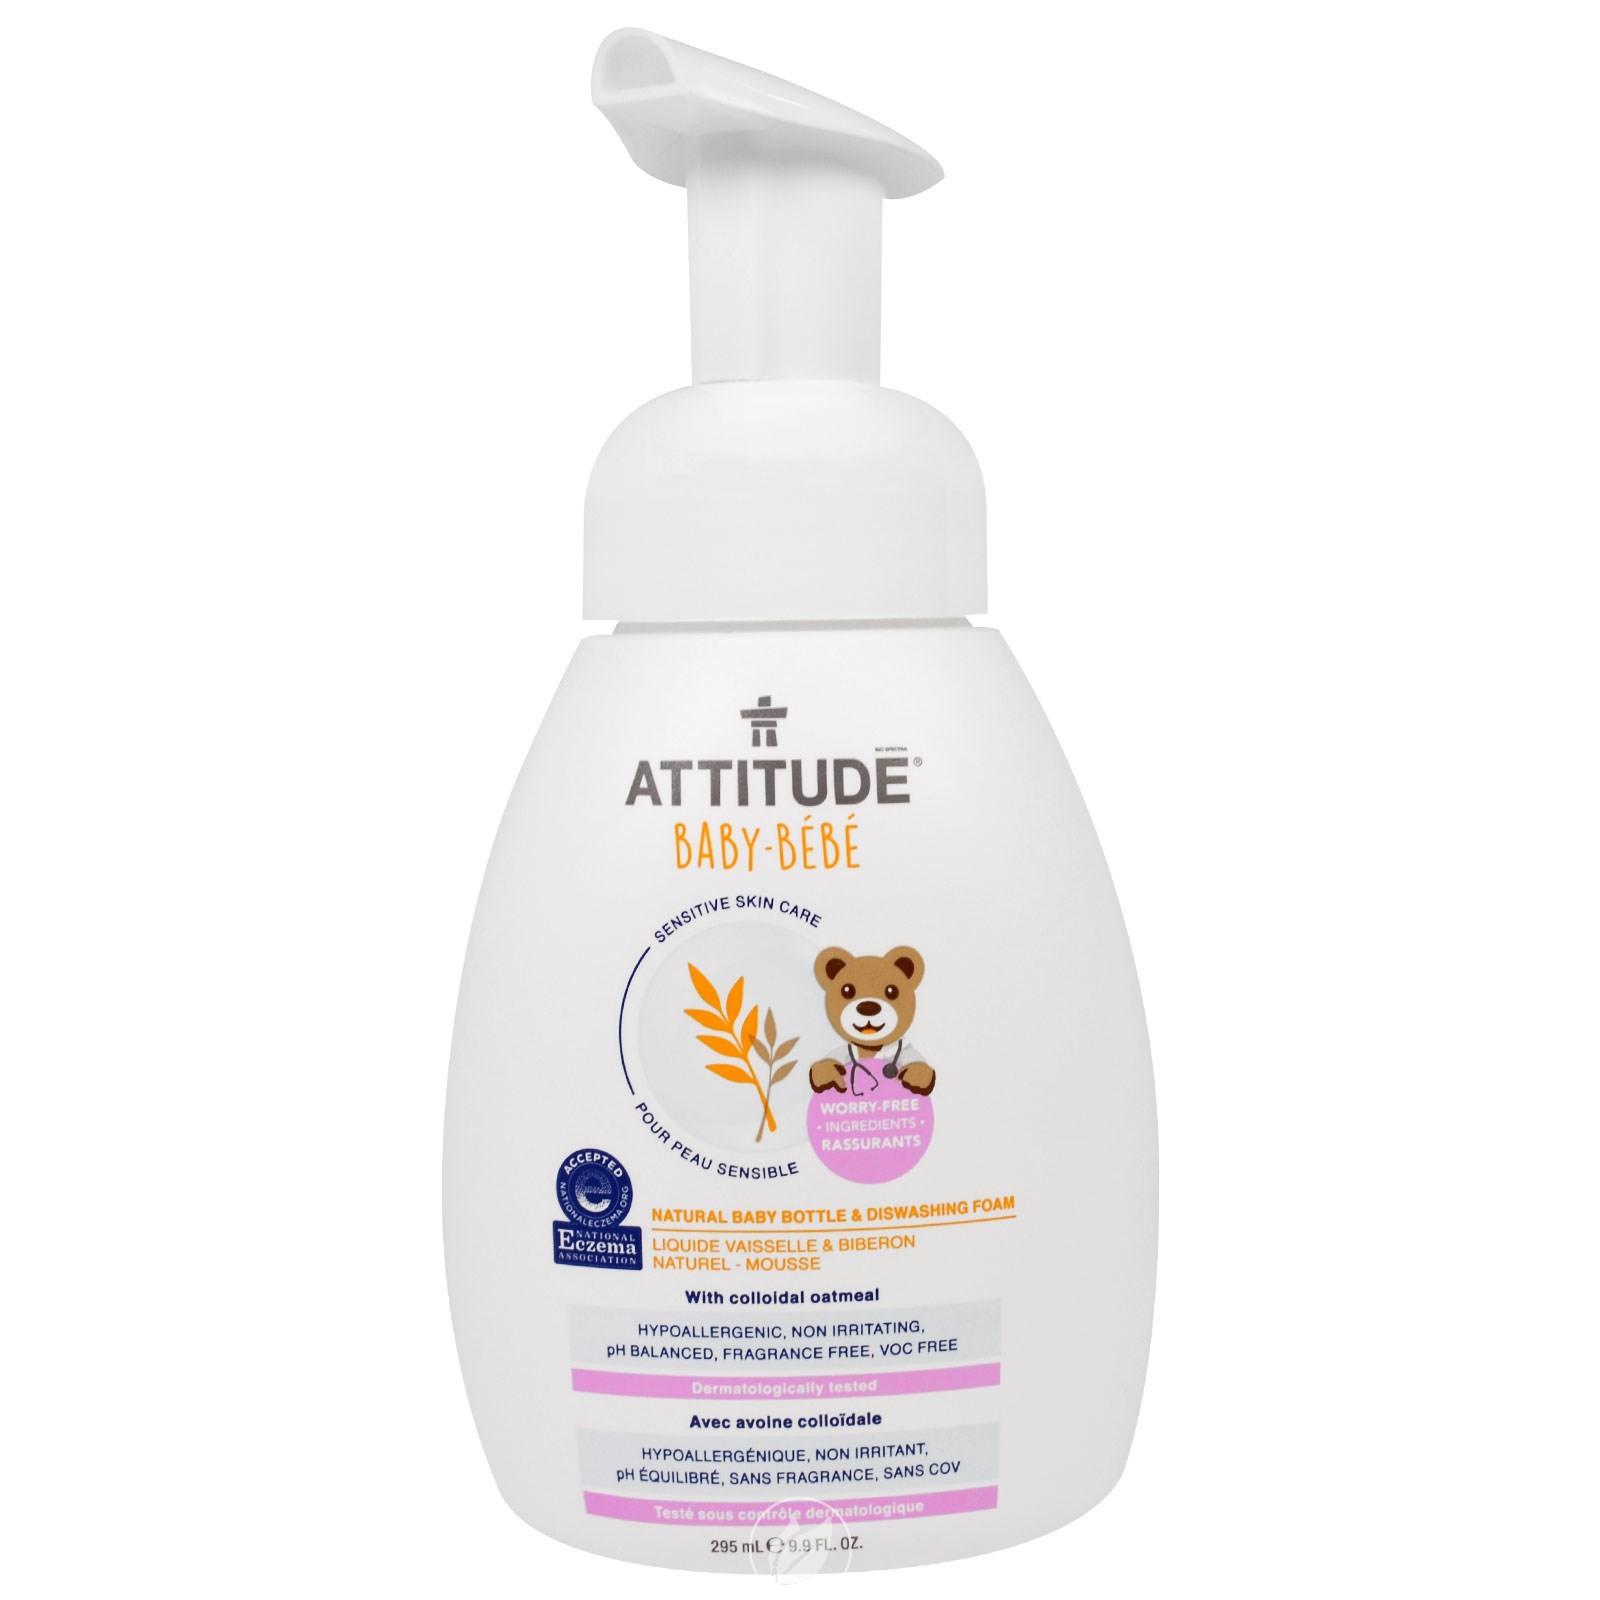 Attitude Sensitive Skin Care Natural Baby Bottle & Dishwashing Foam